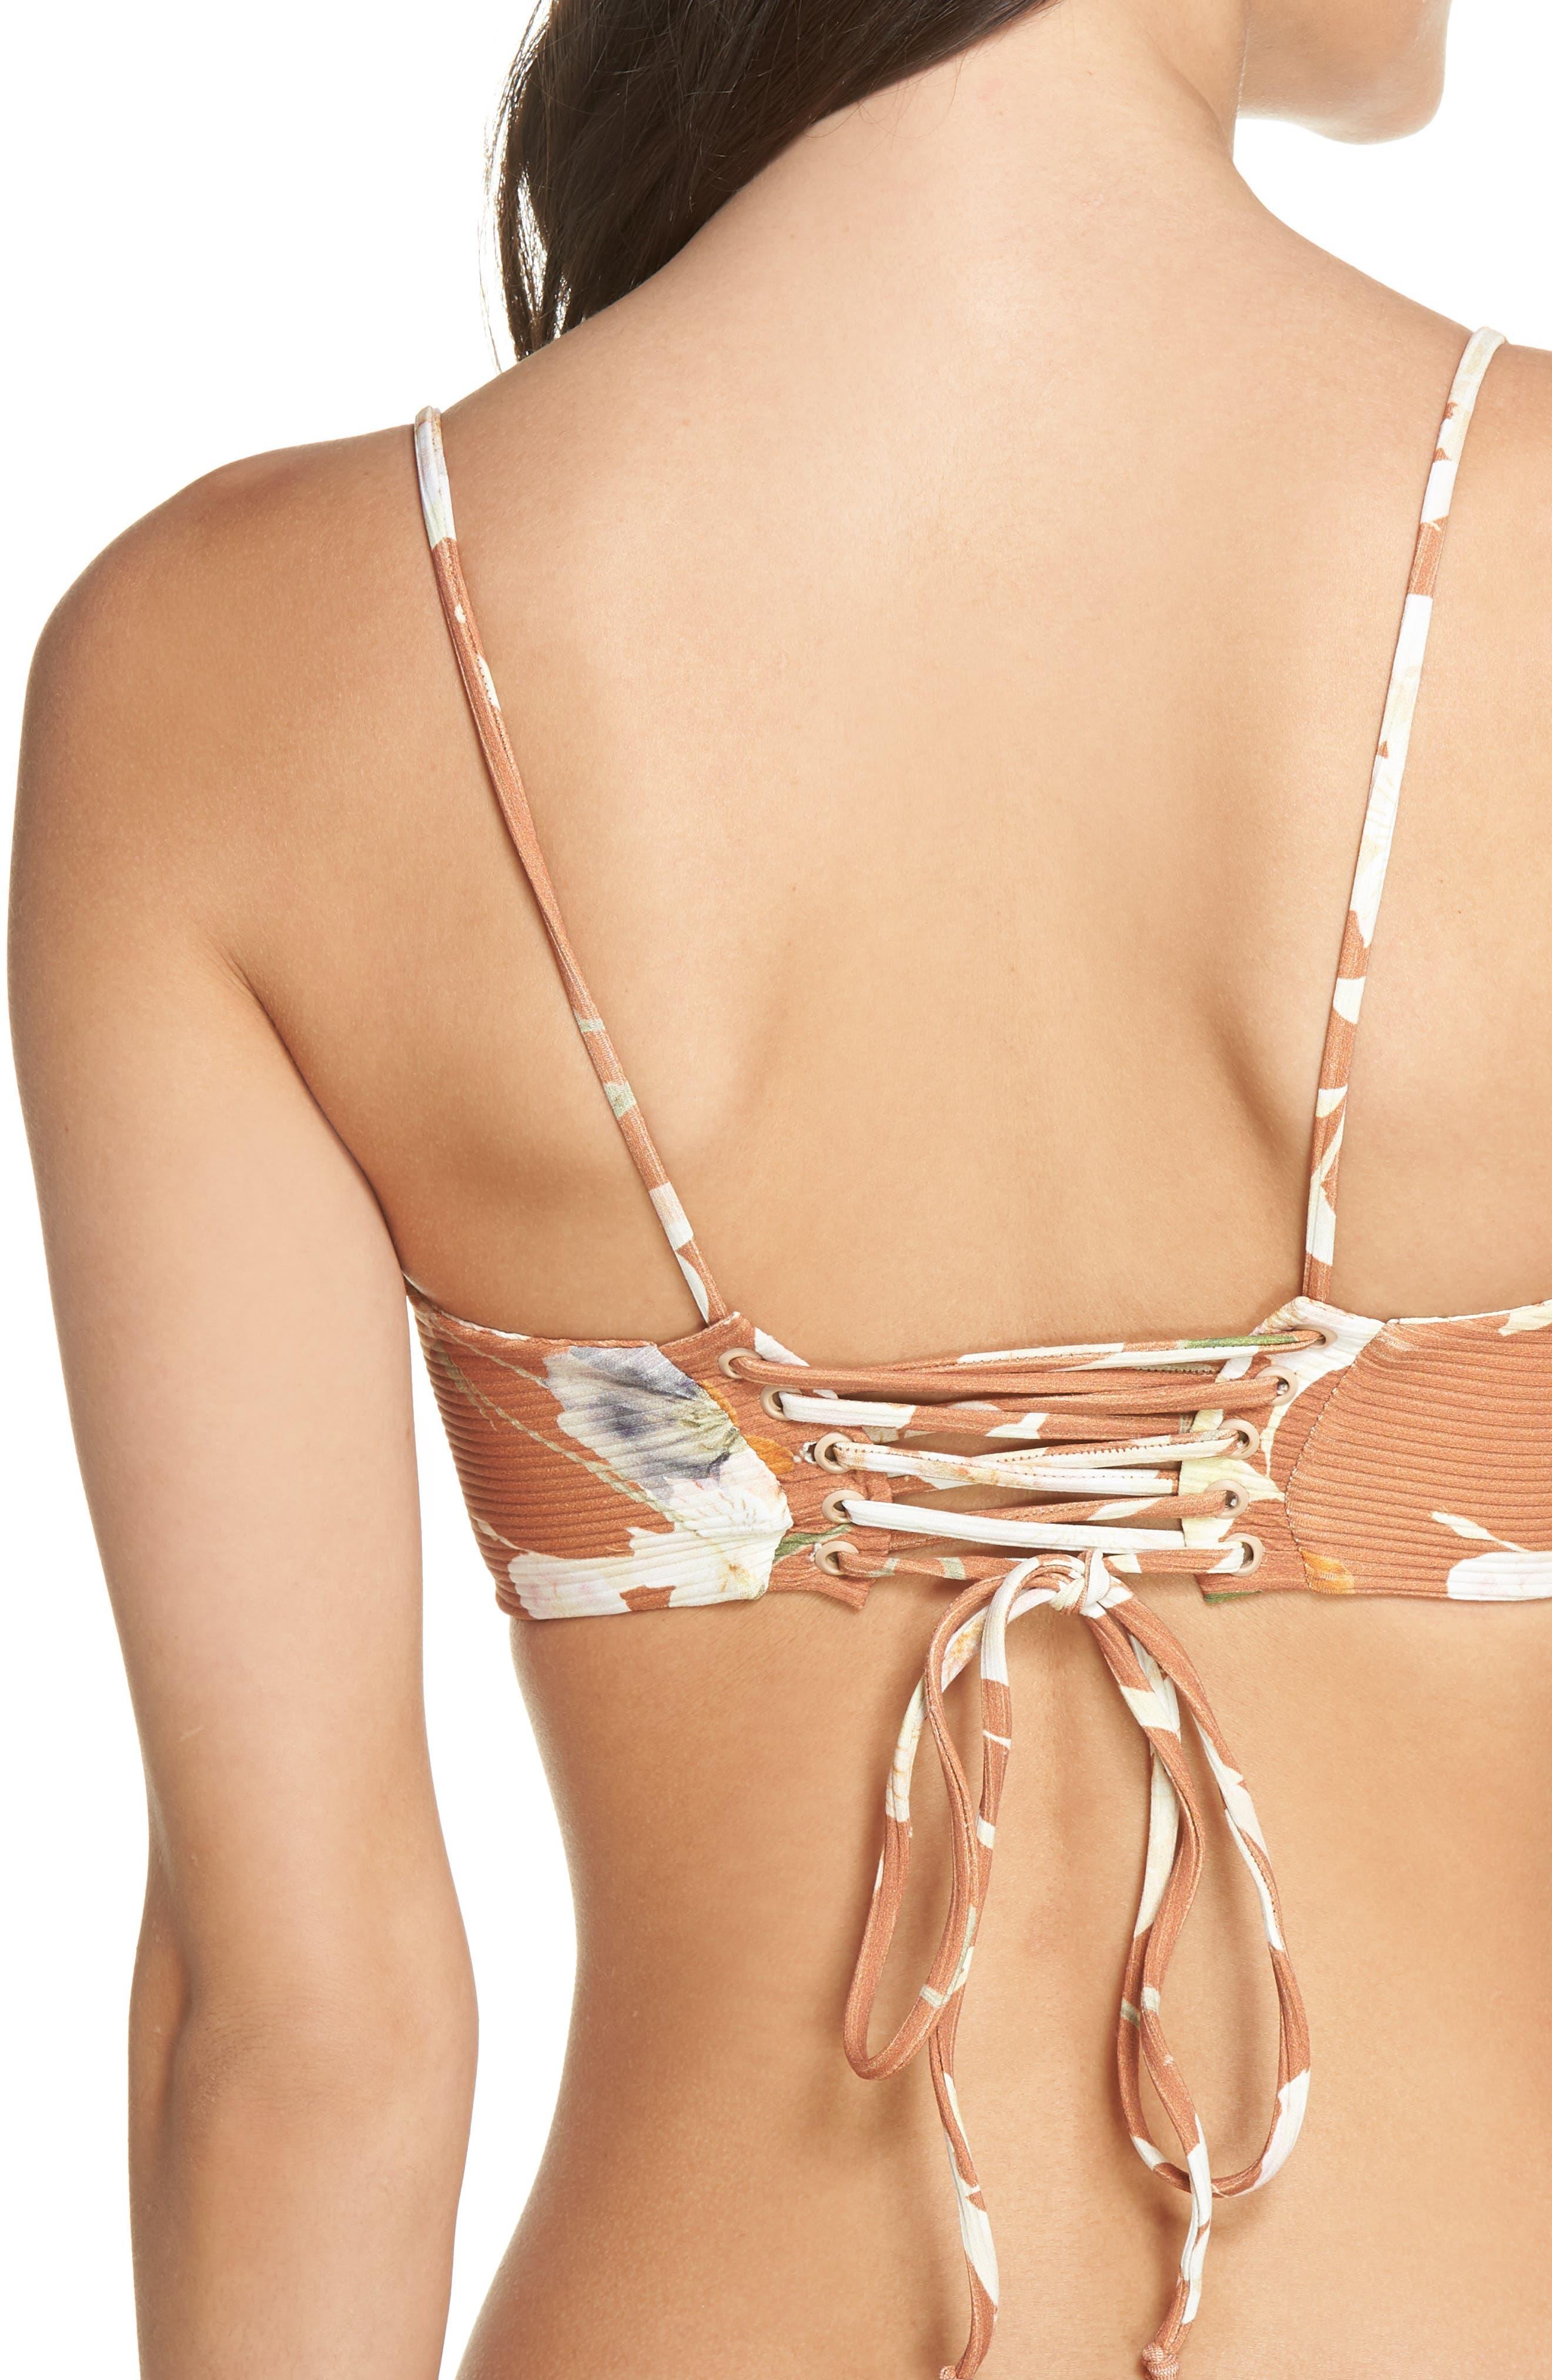 Ms. Jackson Bikini Top,                             Alternate thumbnail 2, color,                             Dirty Dancing